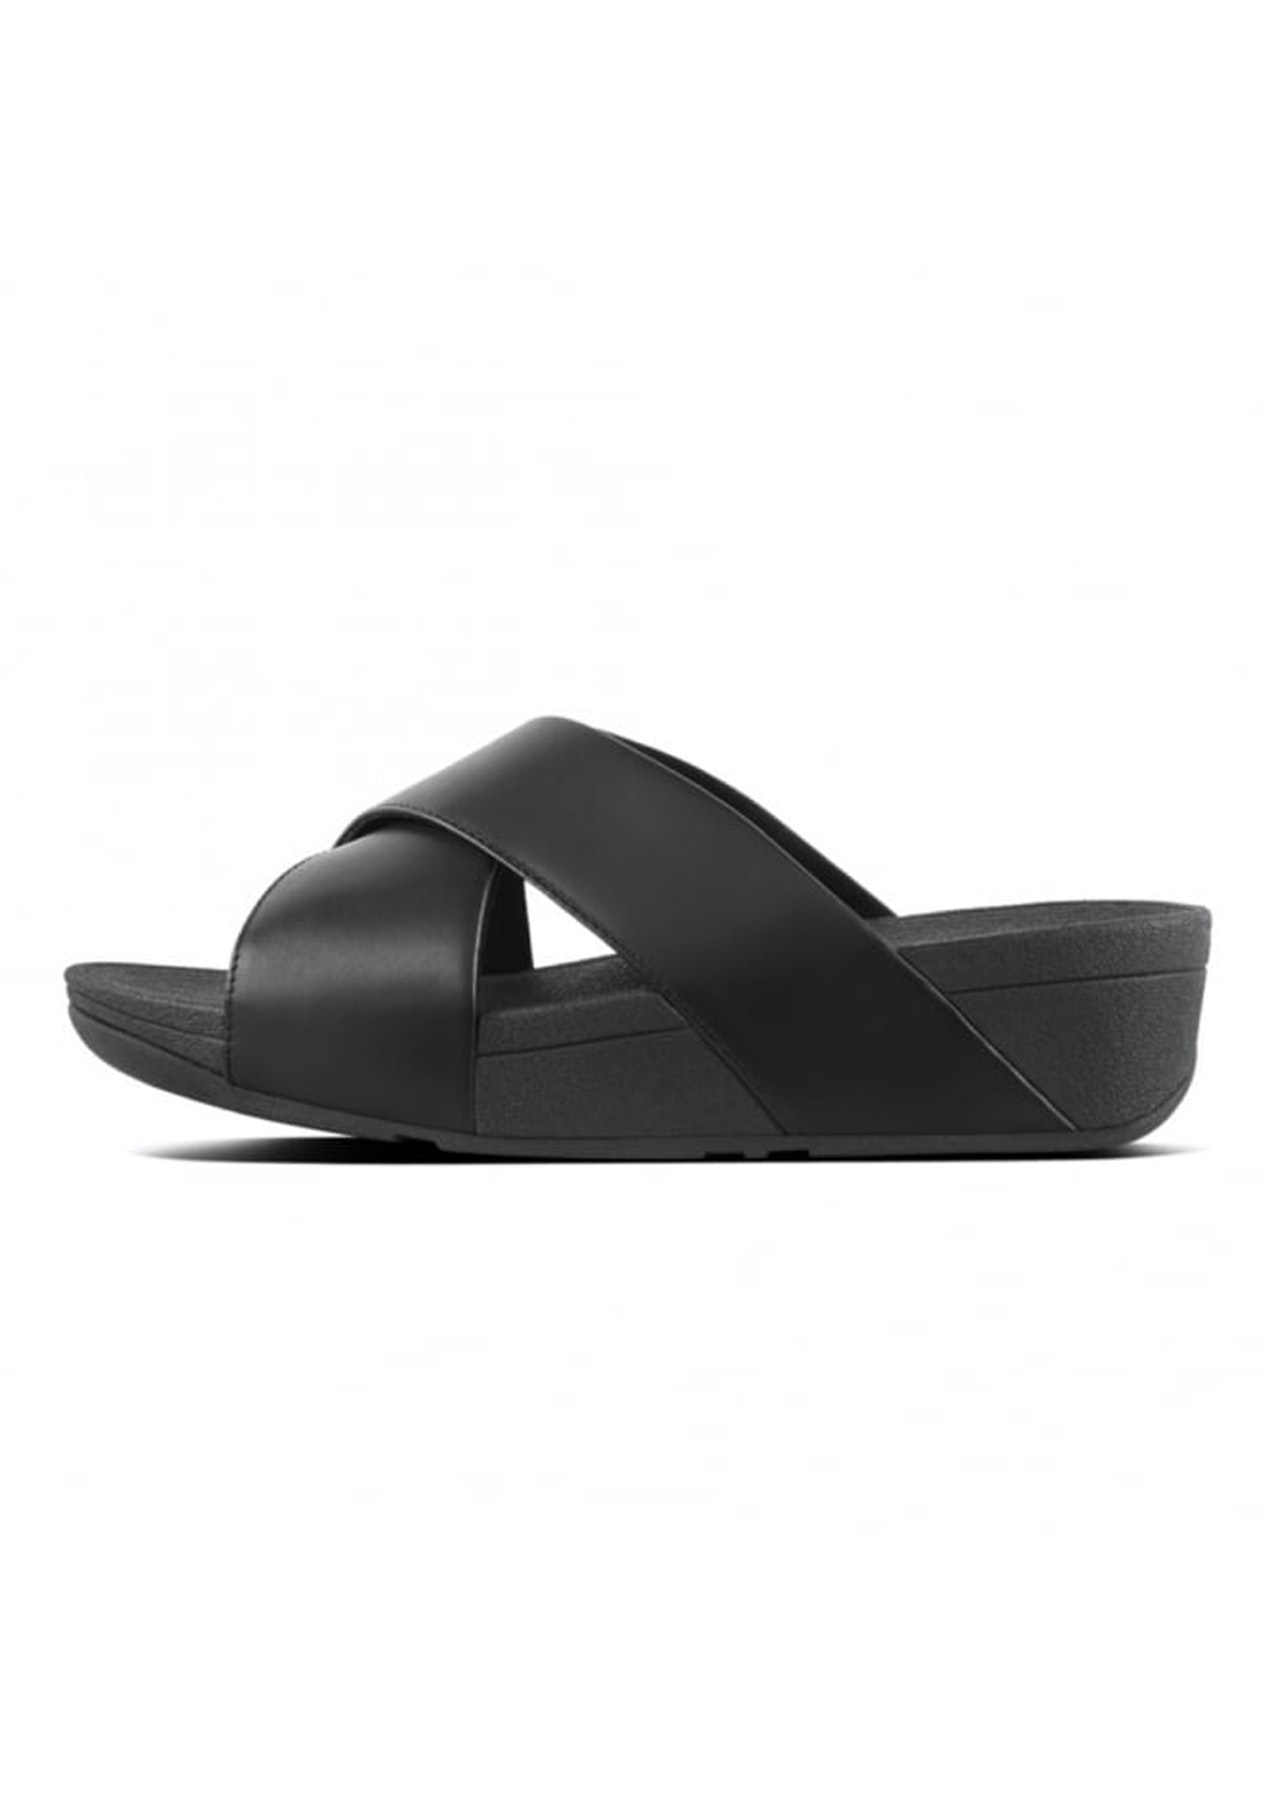 8259a6eb1 Fit Flop - Lulu Cross Slide Sandal -Black - Shoes Garage Sale - Onceit